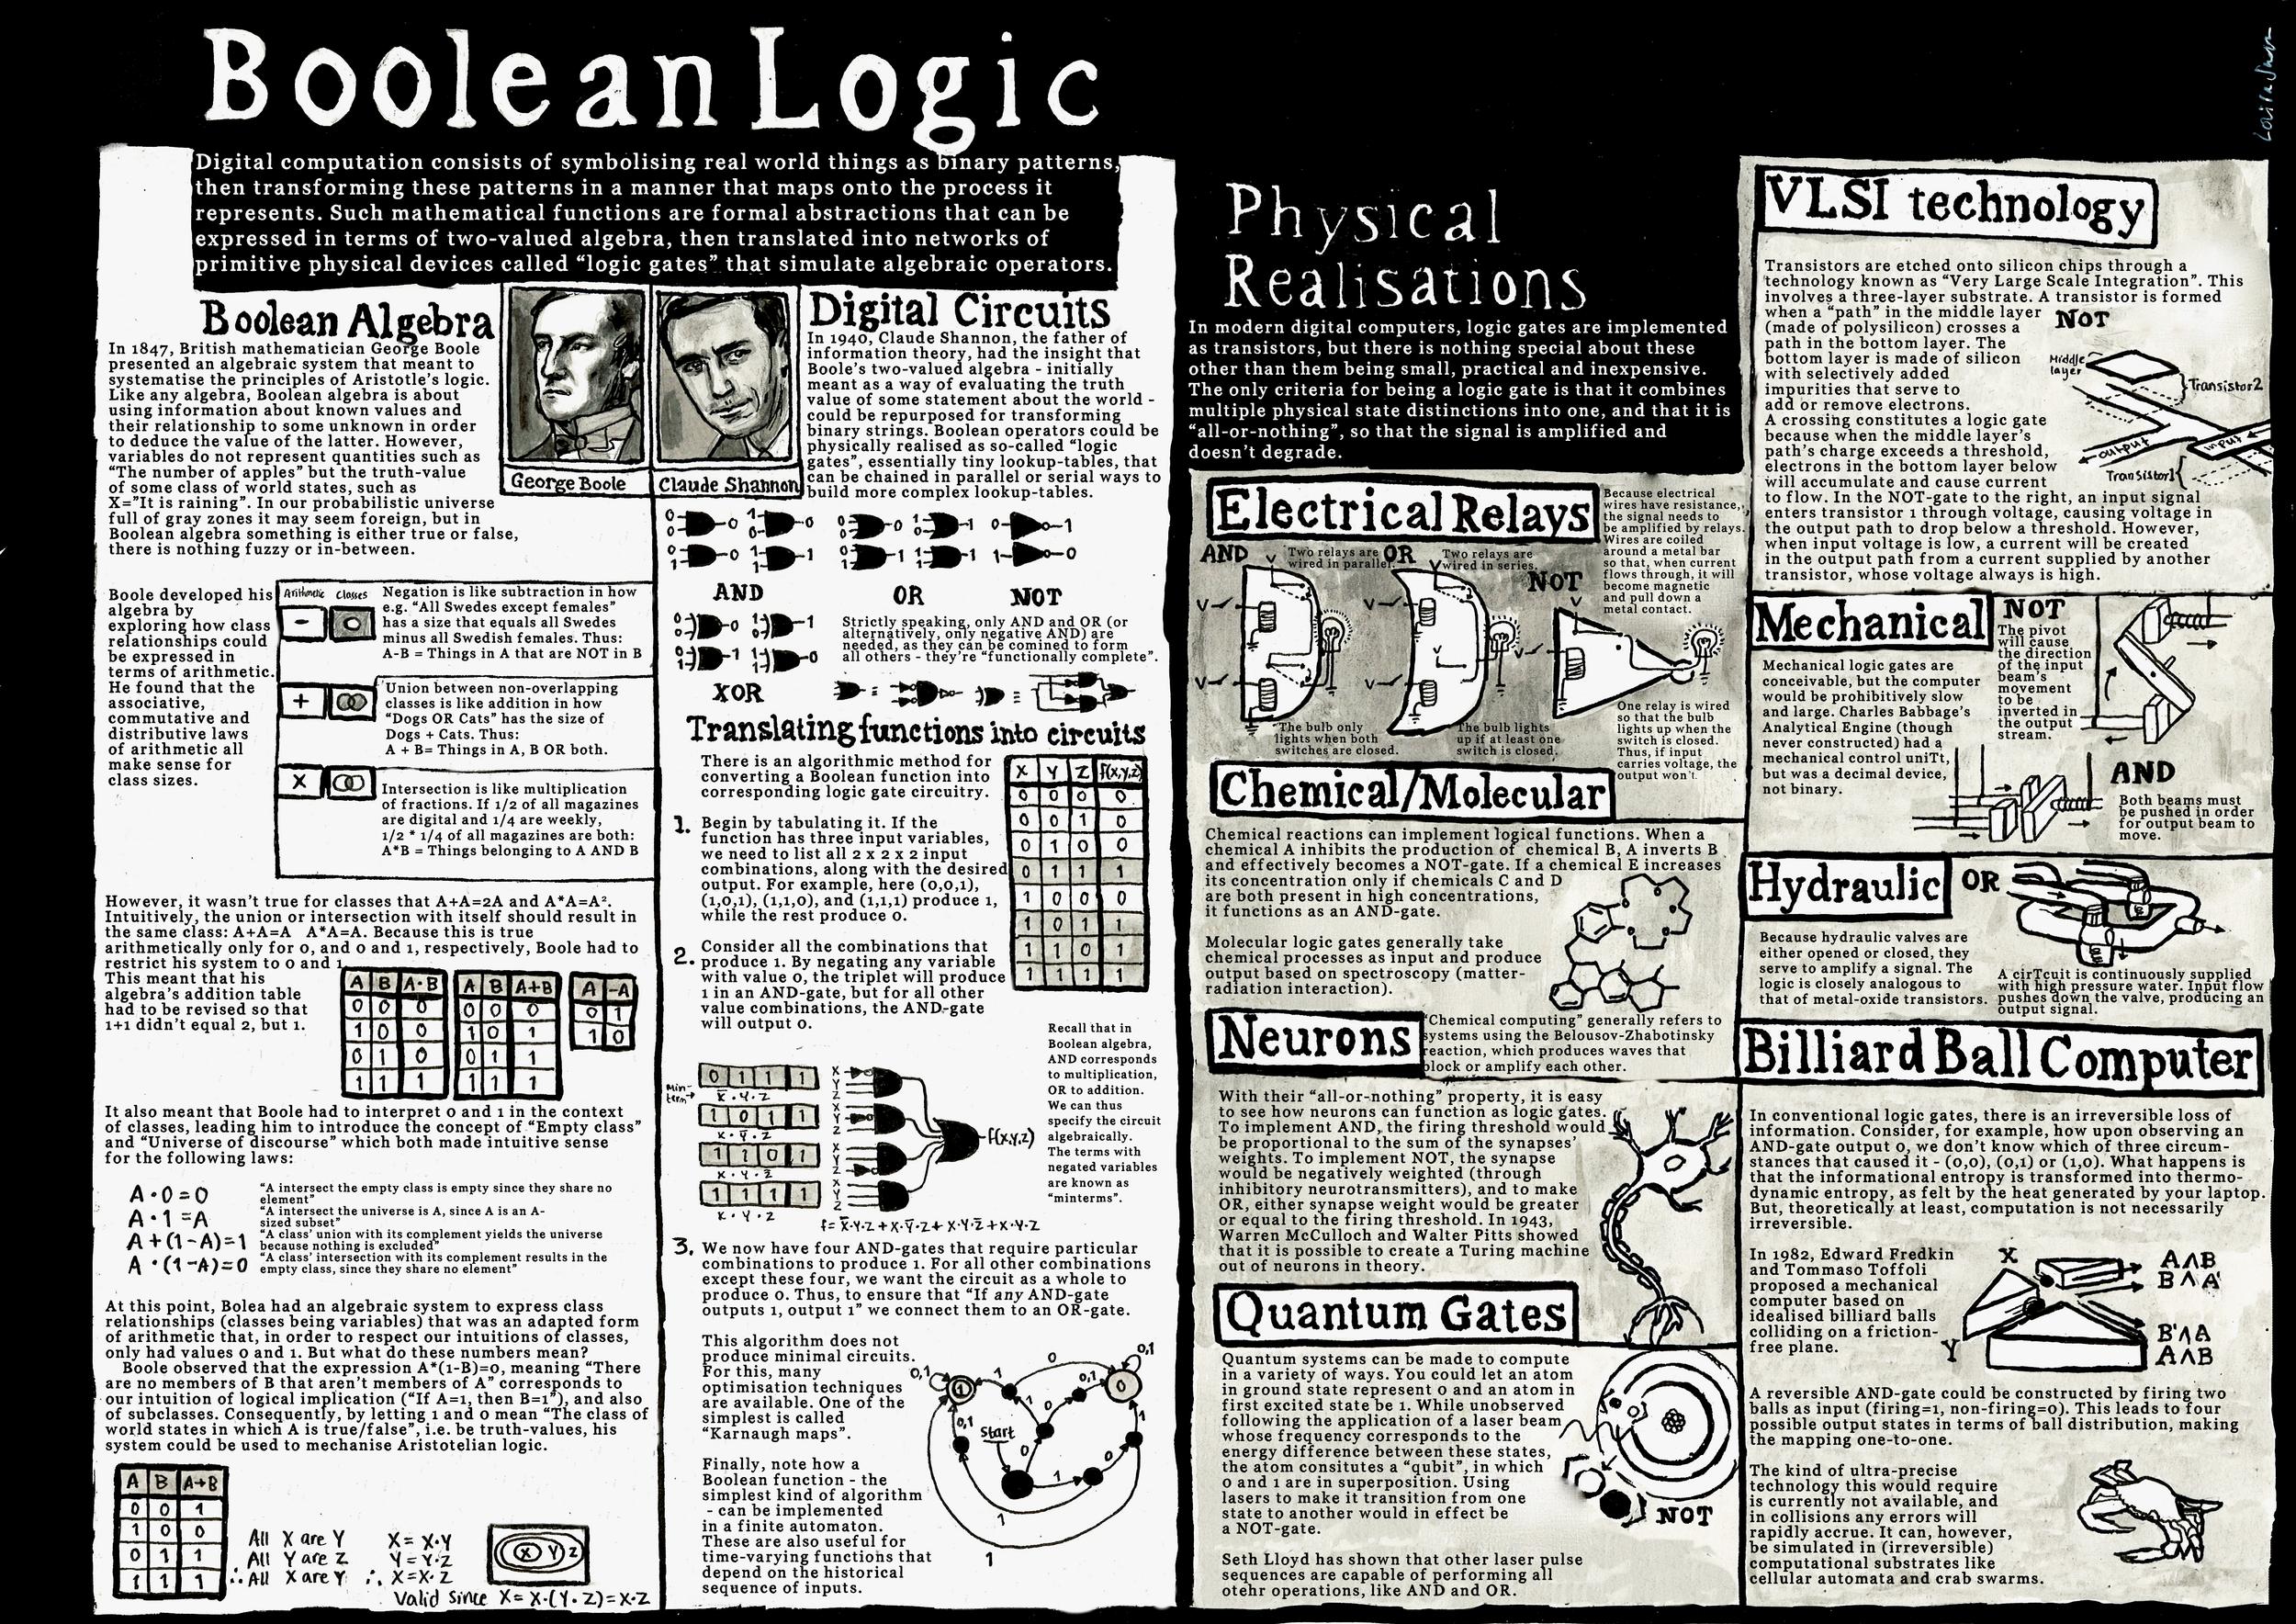 booleanlogic.png